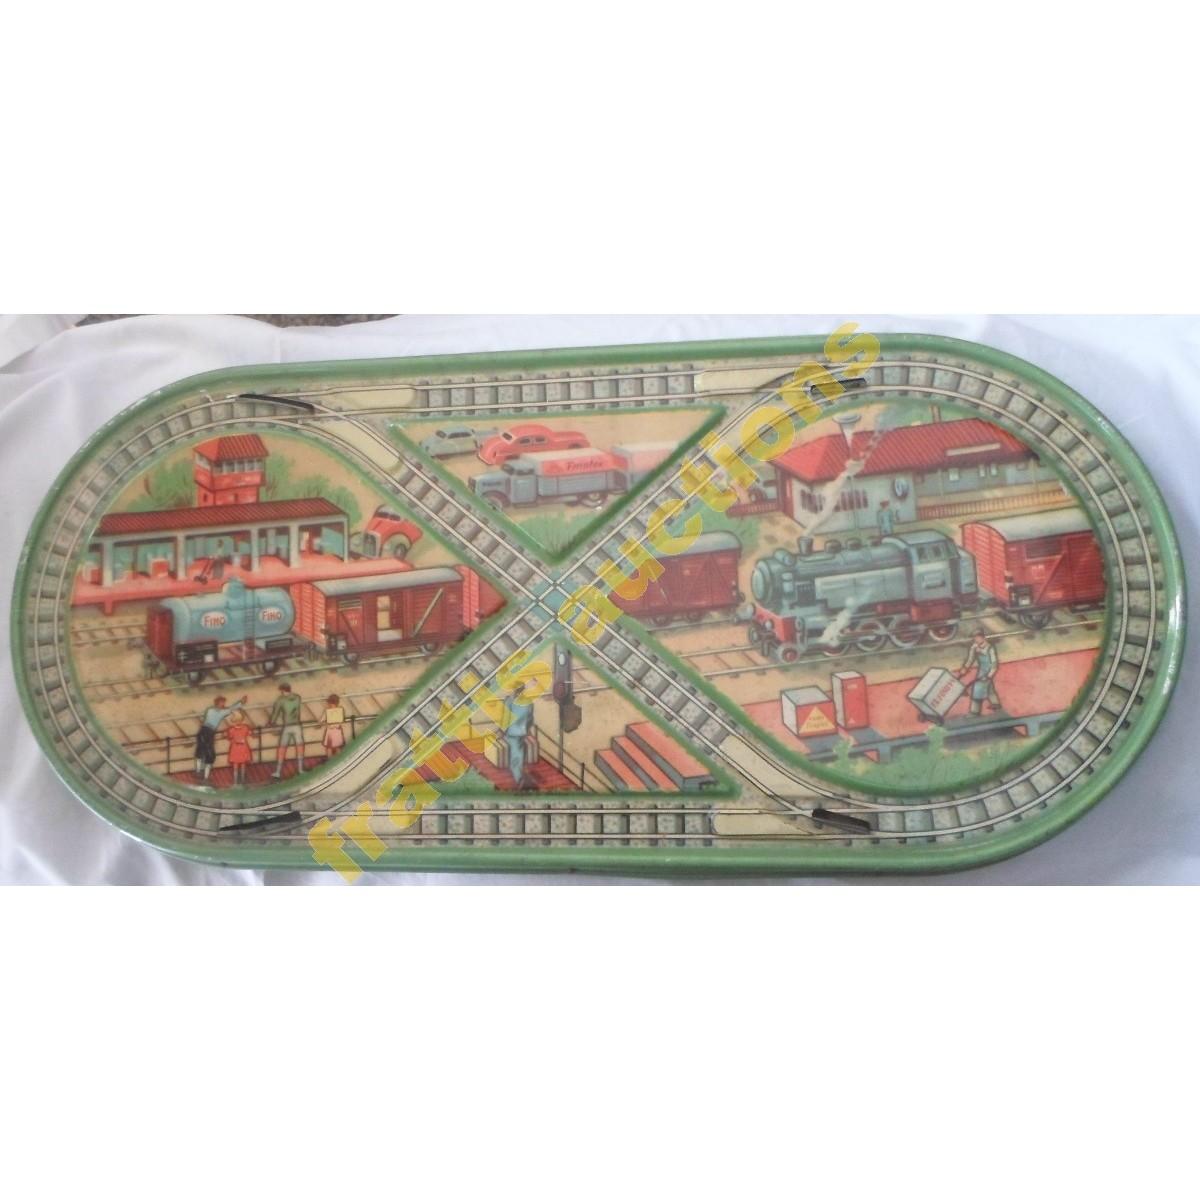 Finotex litho tin plate Ελληνικό παιχνίδι με μοτίβο ενός σιδηροδρομικού σταθμού της δεκαετίας του '50